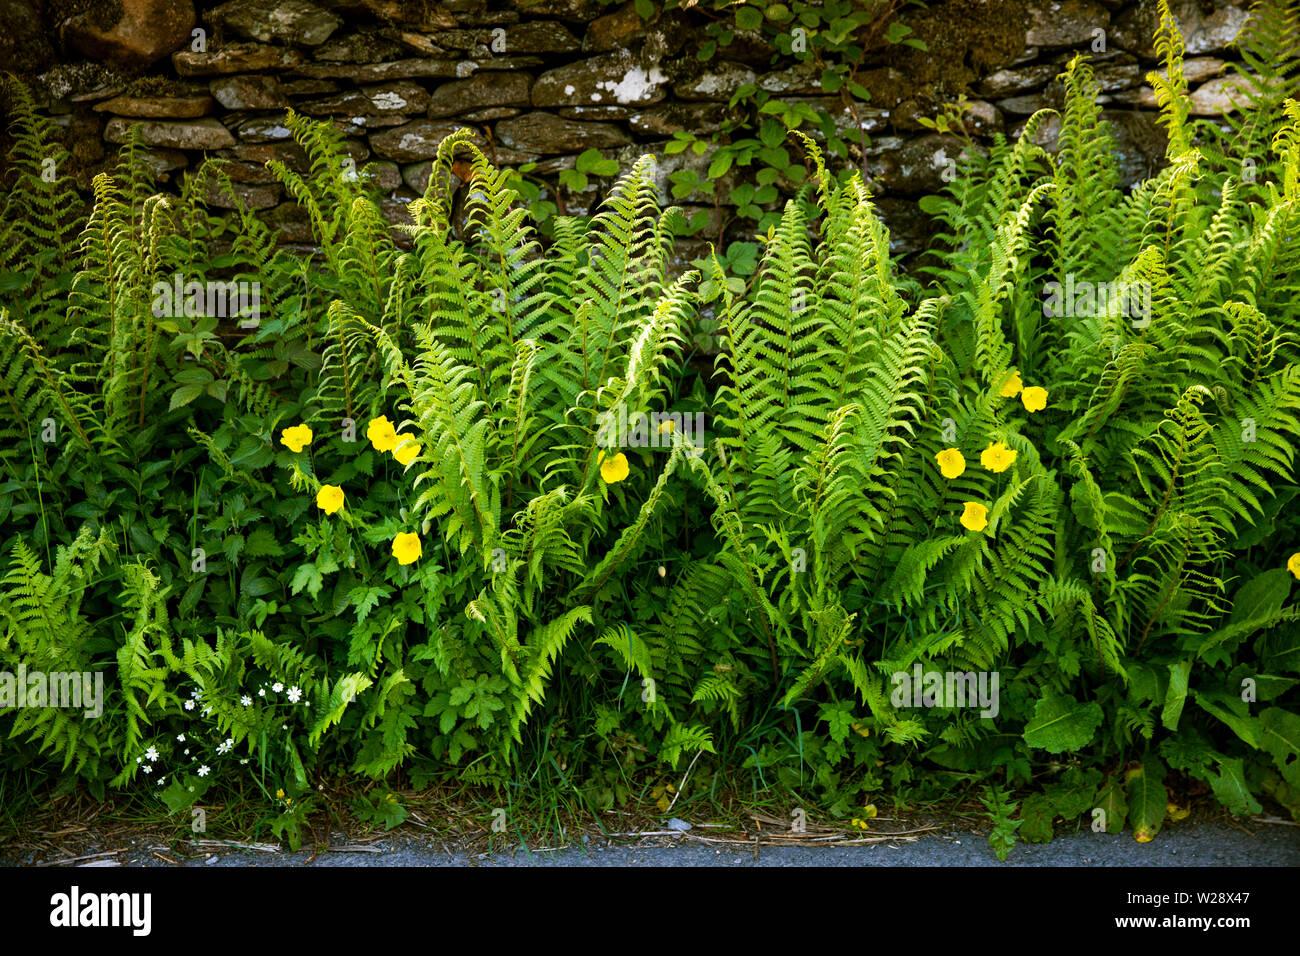 UK; Cumbria; Hawkshead; Near Sawrey; Ees Bridge; roadside ferns and yellow poppies growing on country lane verge Stock Photo